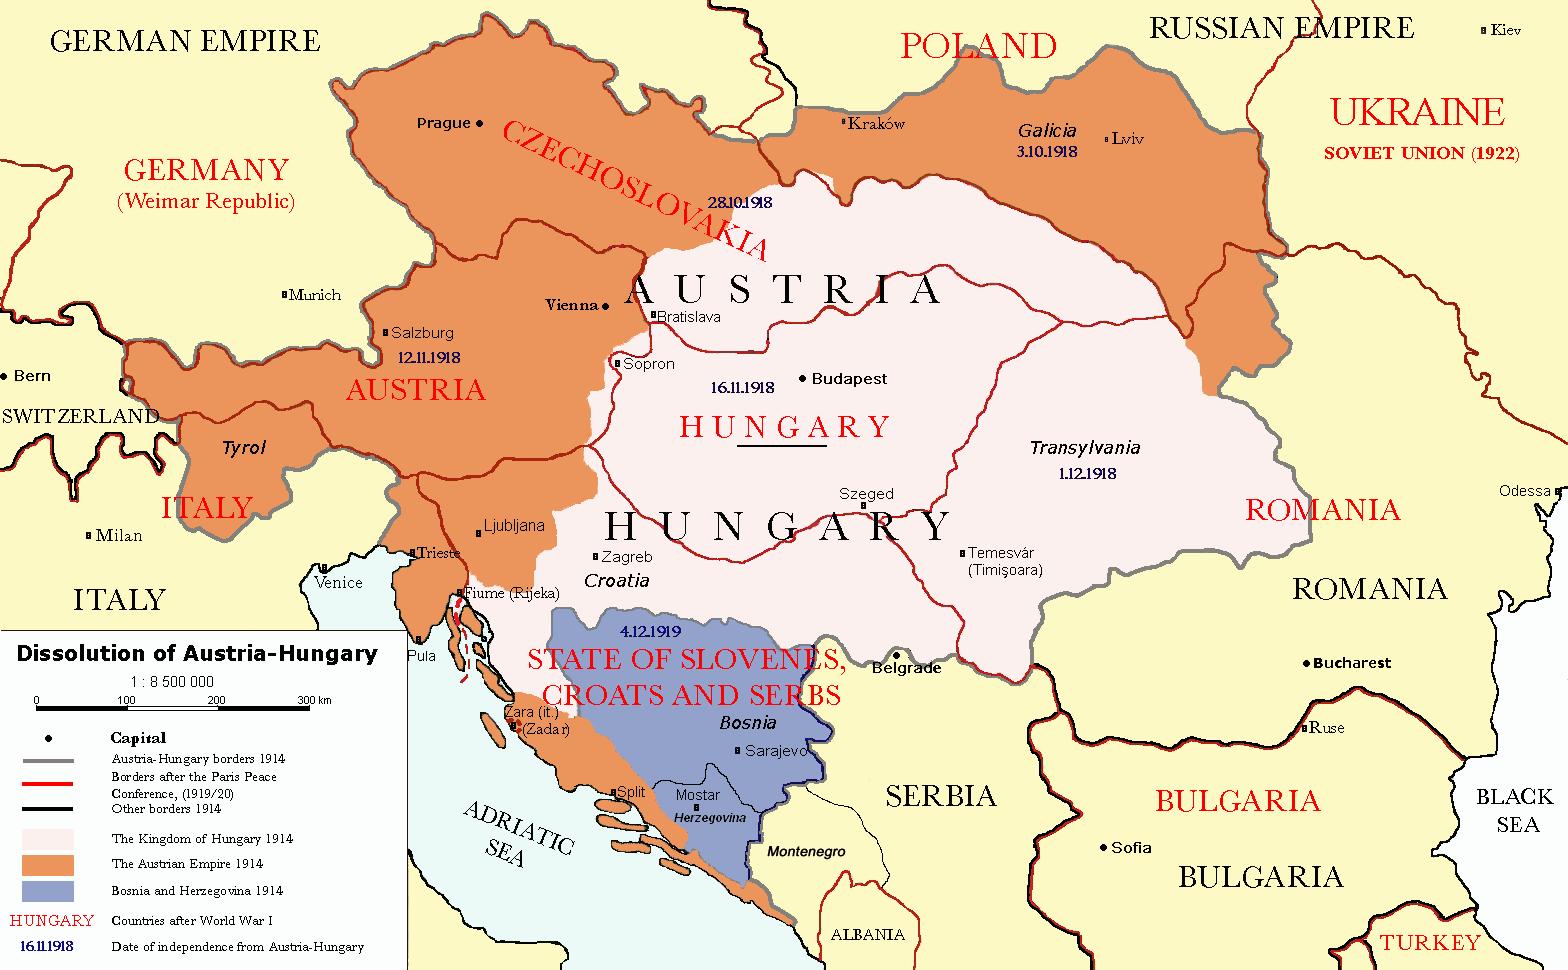 Dissolution of AustriaHungary Aftermath of World War I